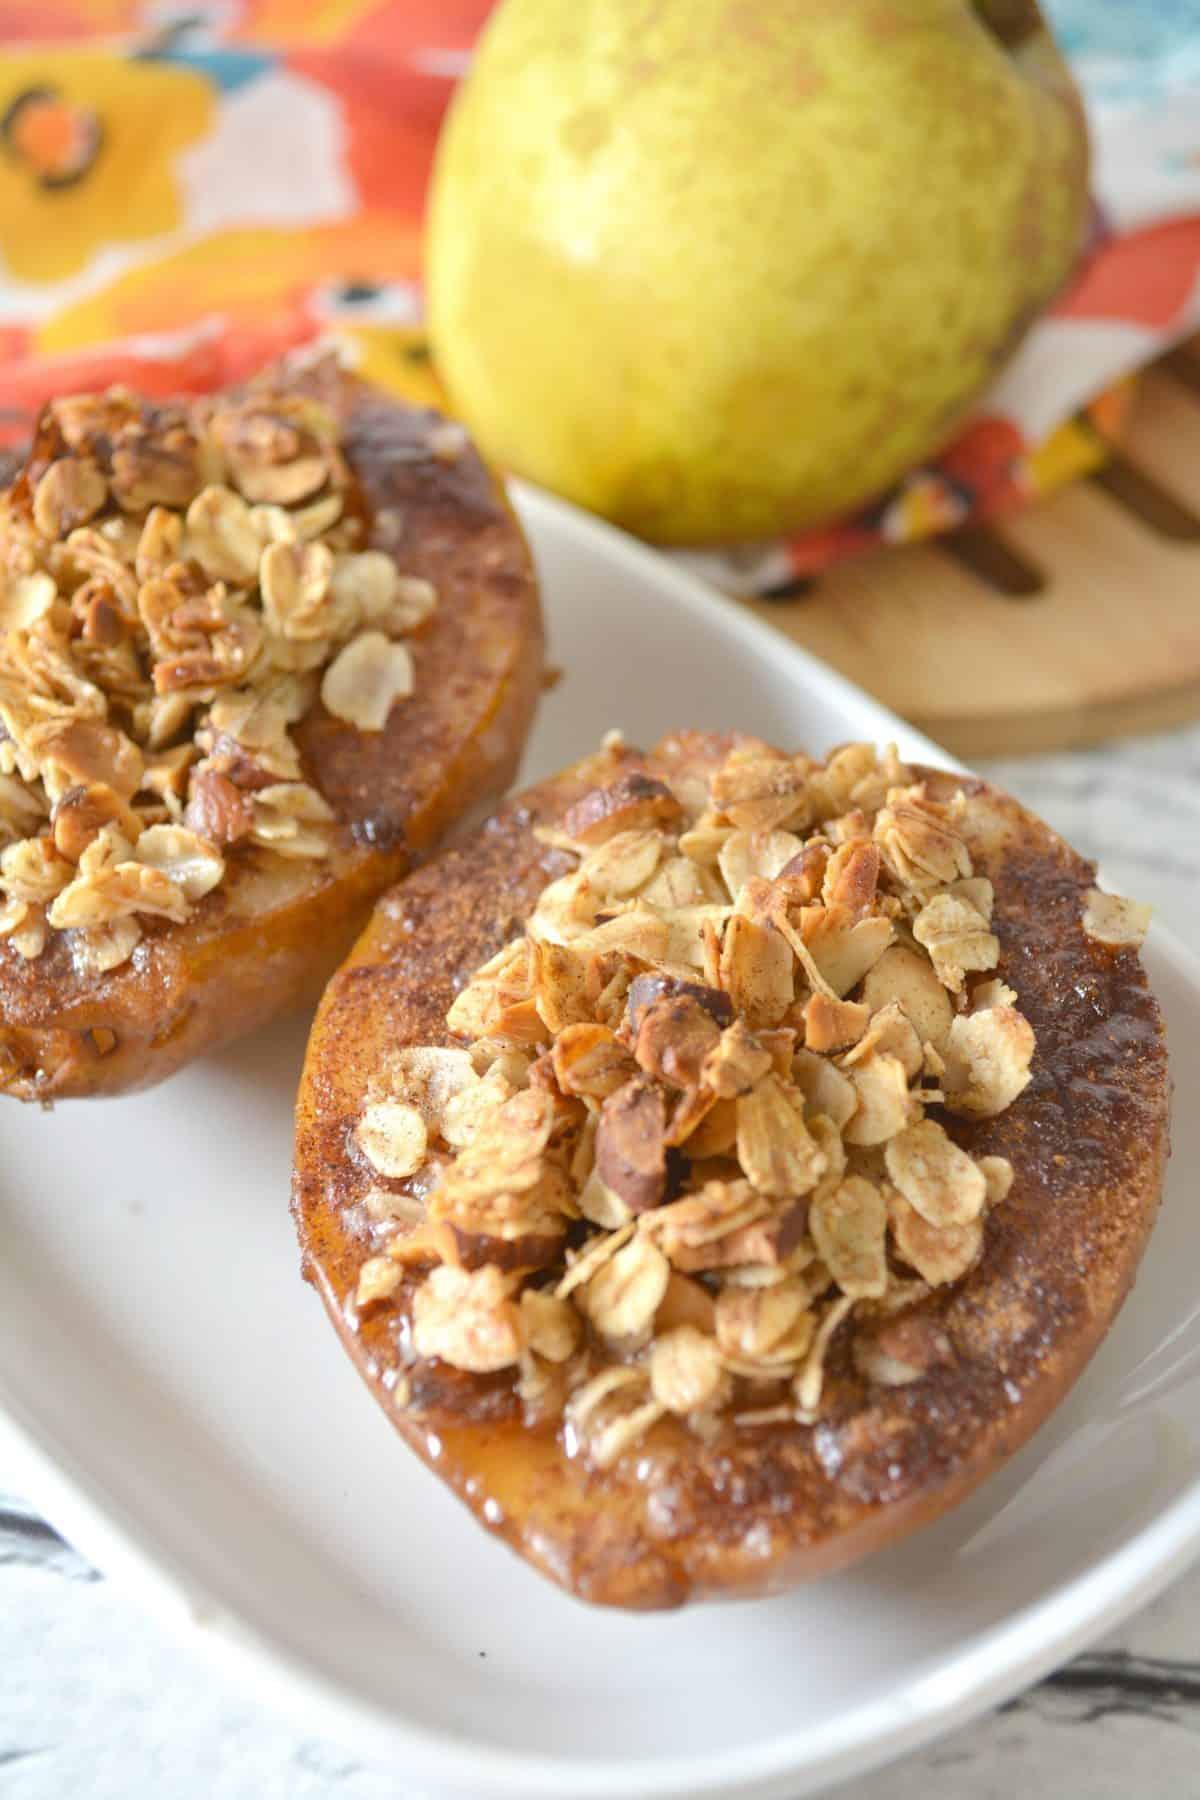 Cinnamon Sugar Baked Pears with Granola Crumble